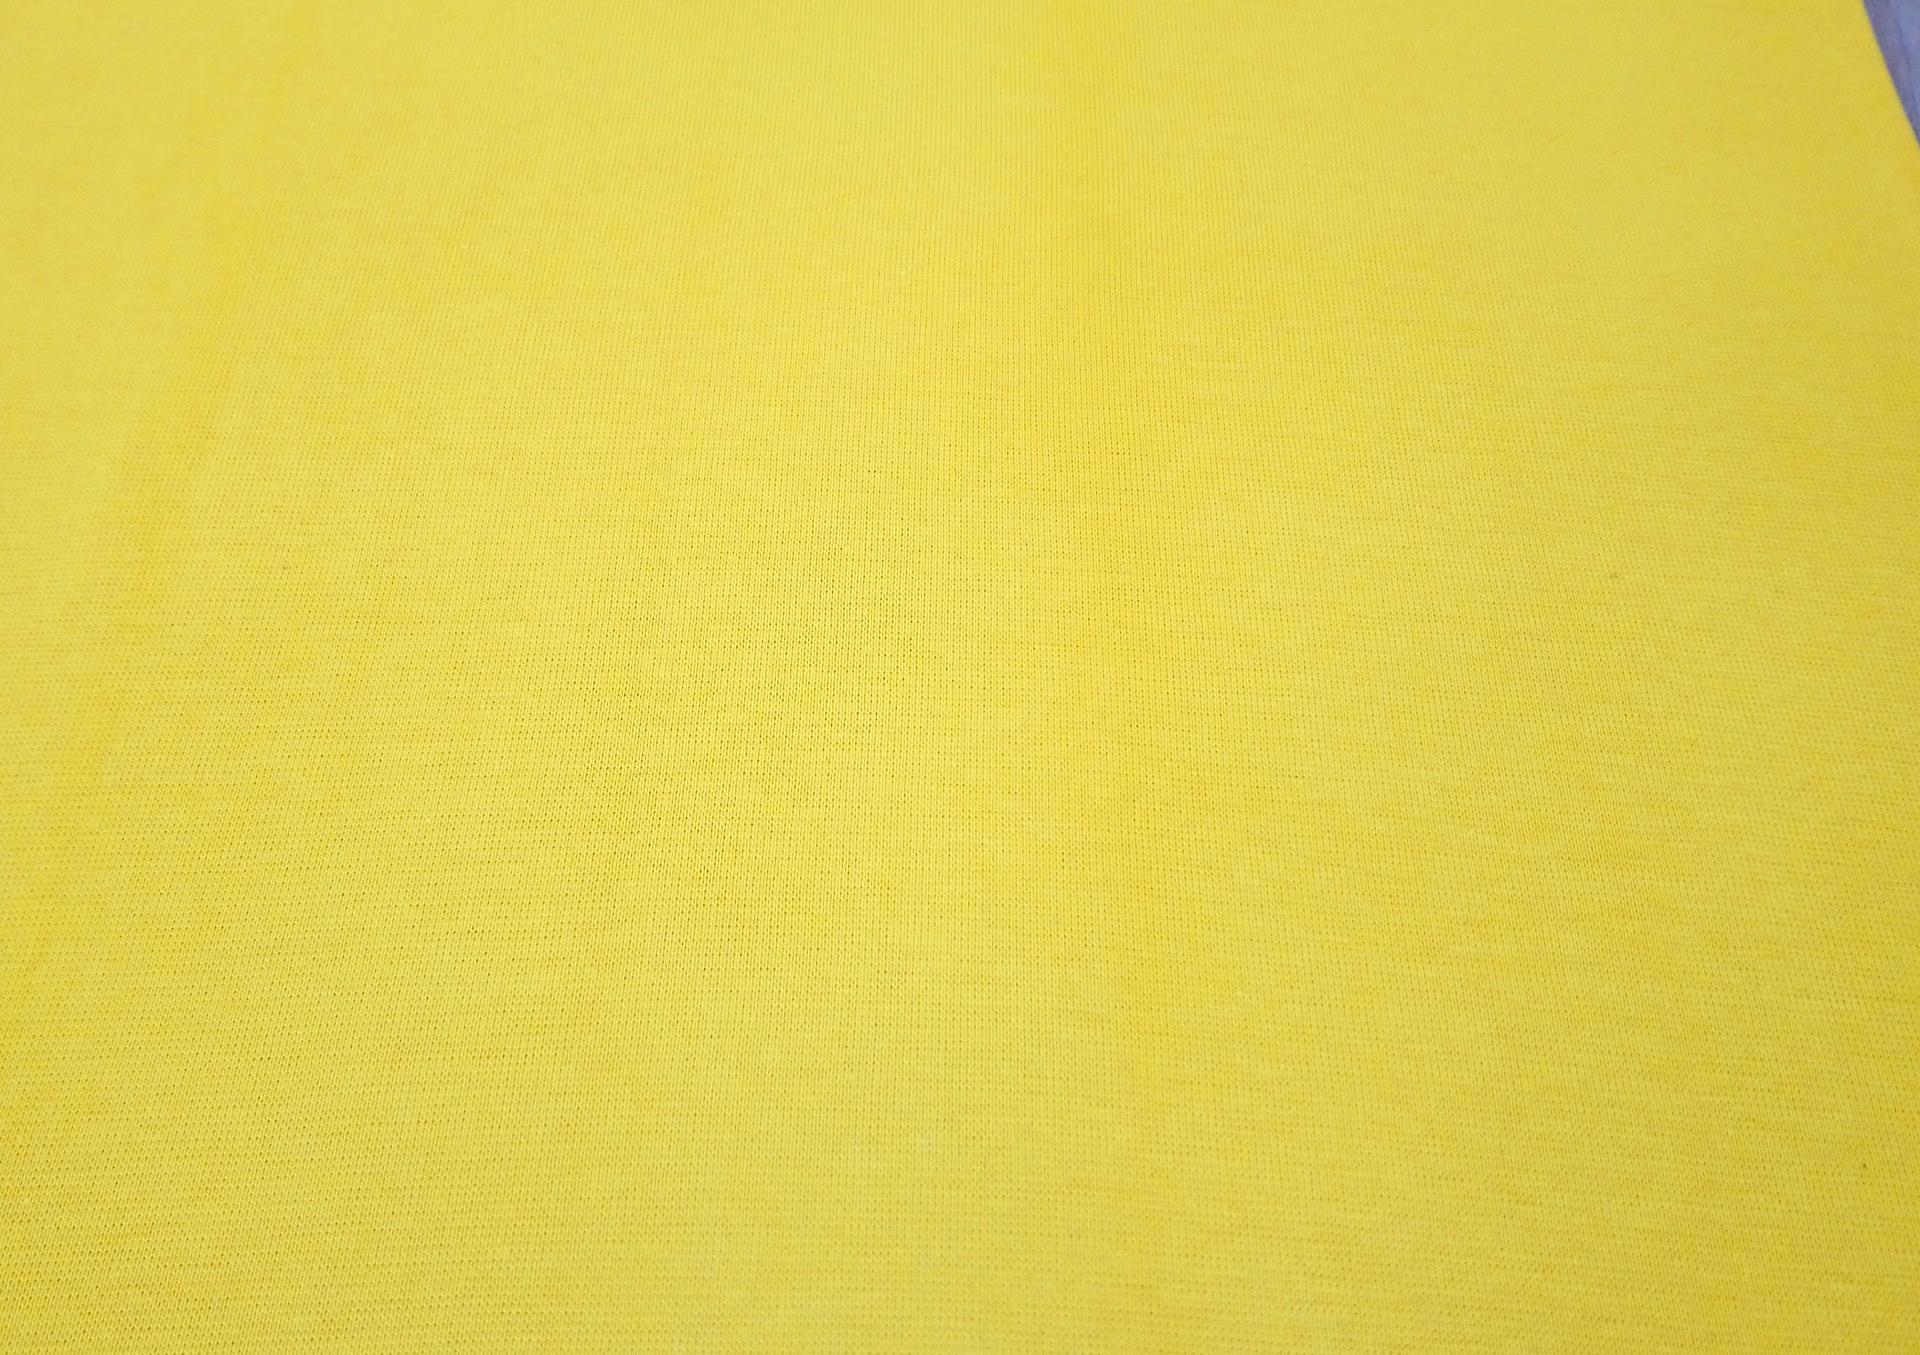 Bord cote jaune 2